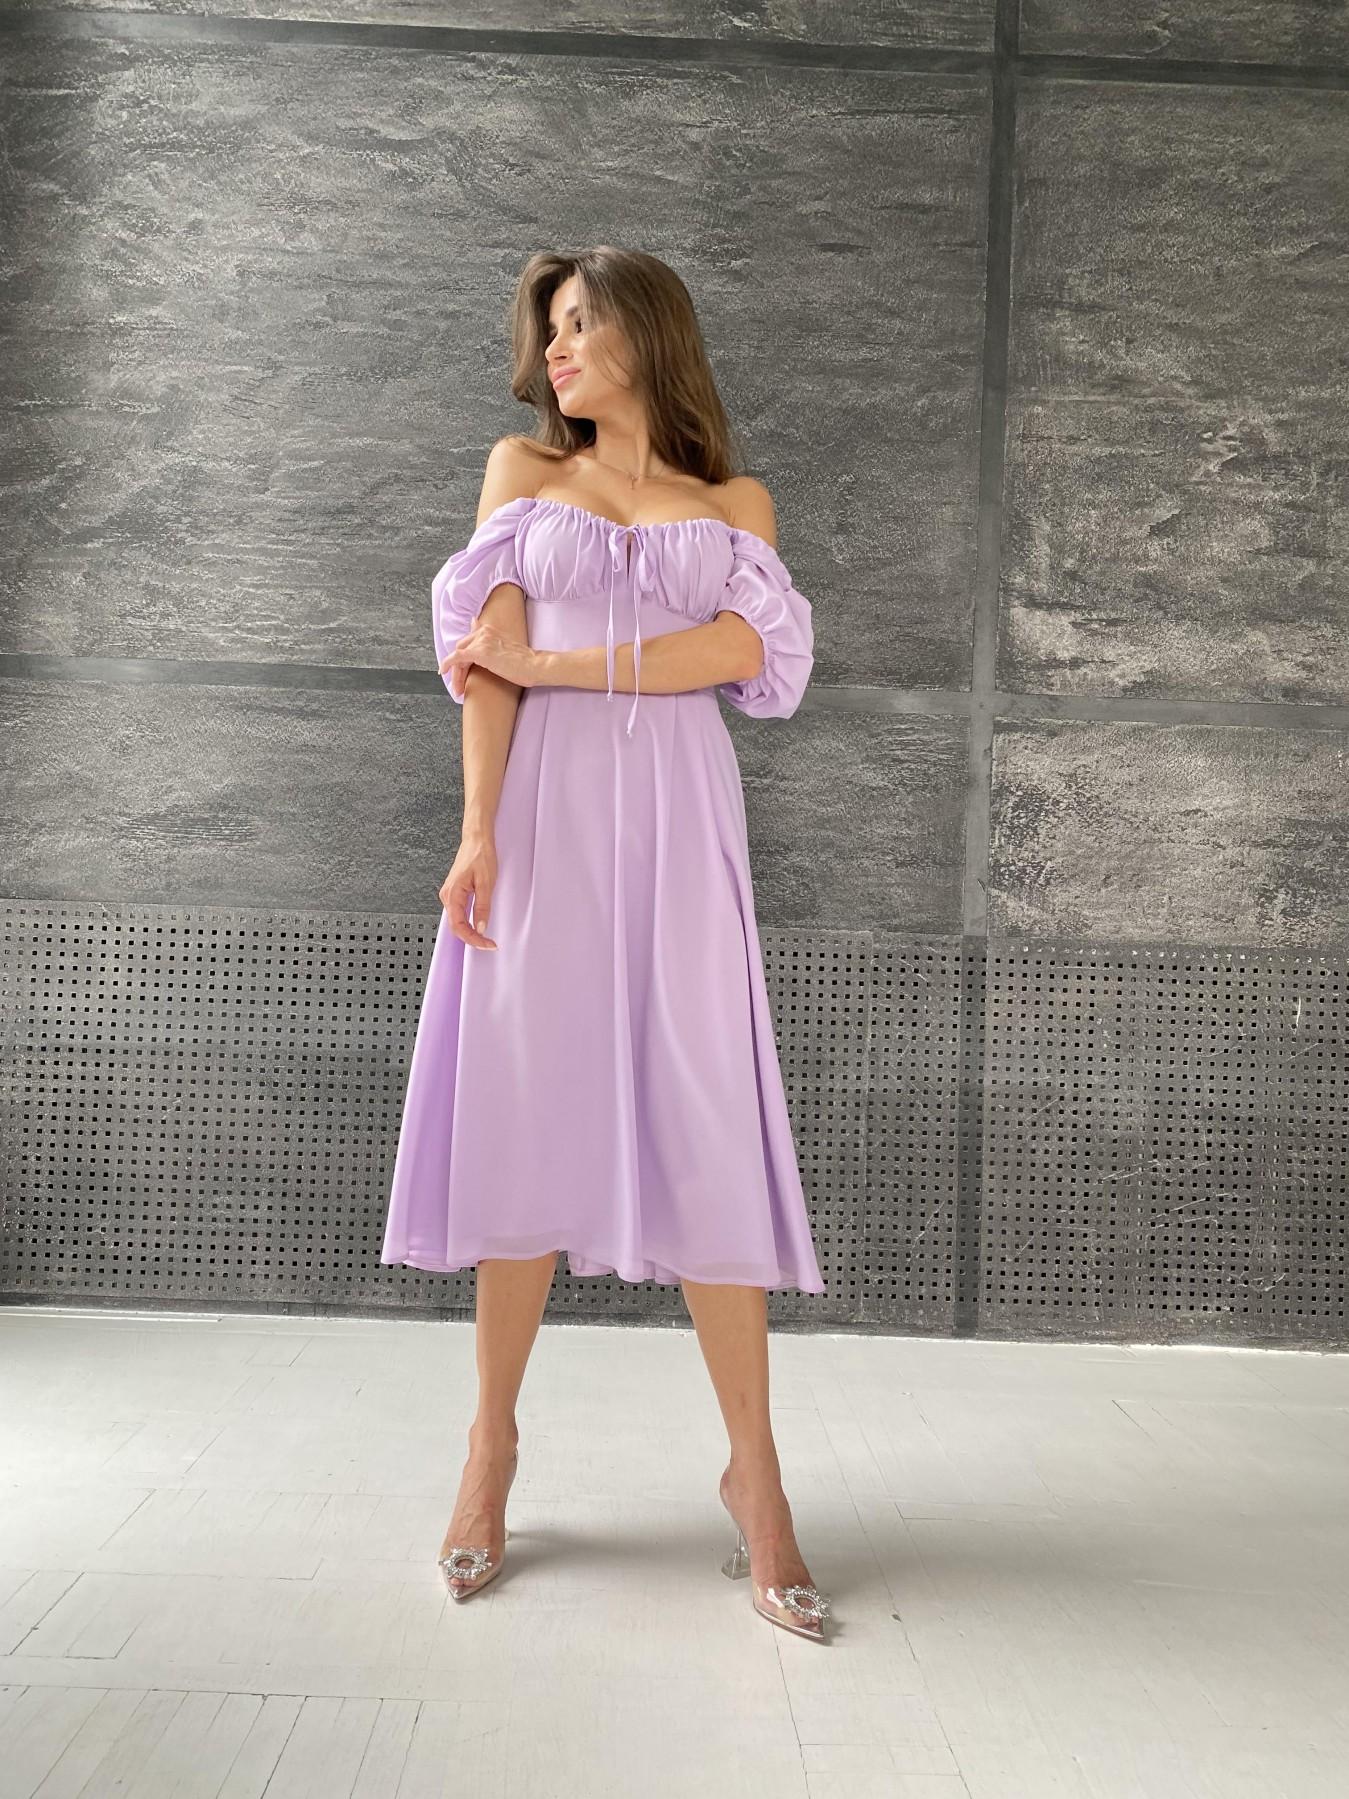 Кисес Миди платье из шифона креп 11443 АРТ. 48311 Цвет: Лаванда - фото 6, интернет магазин tm-modus.ru